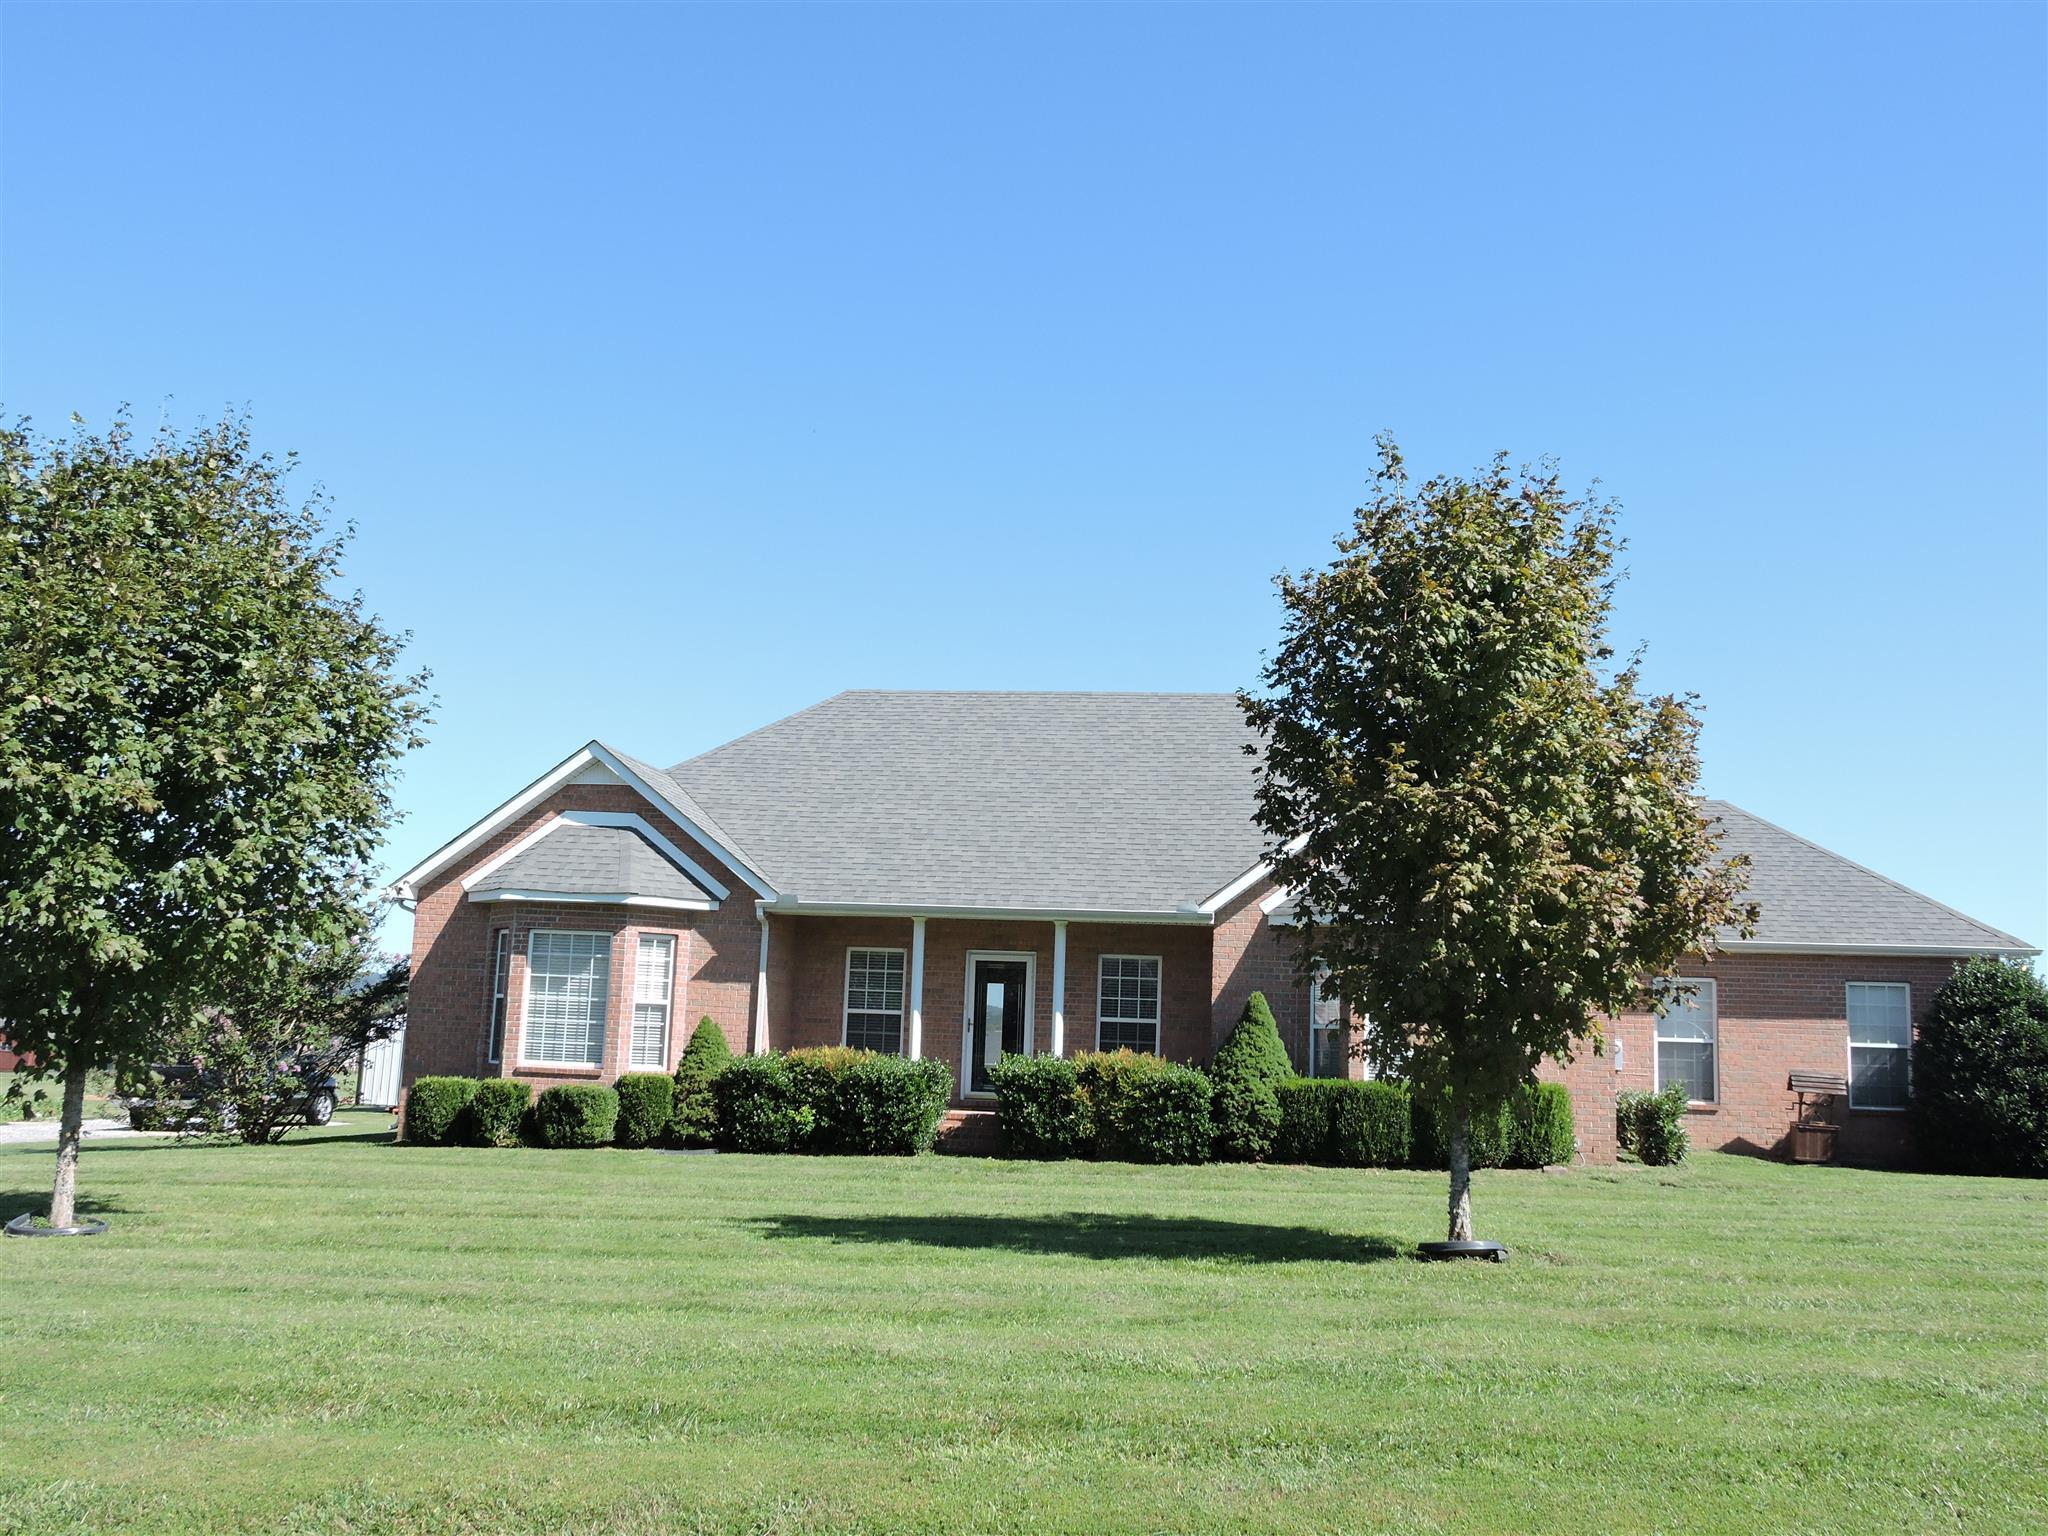 1087 Pinnacle Way, Castalian Springs, TN 37031 - Castalian Springs, TN real estate listing